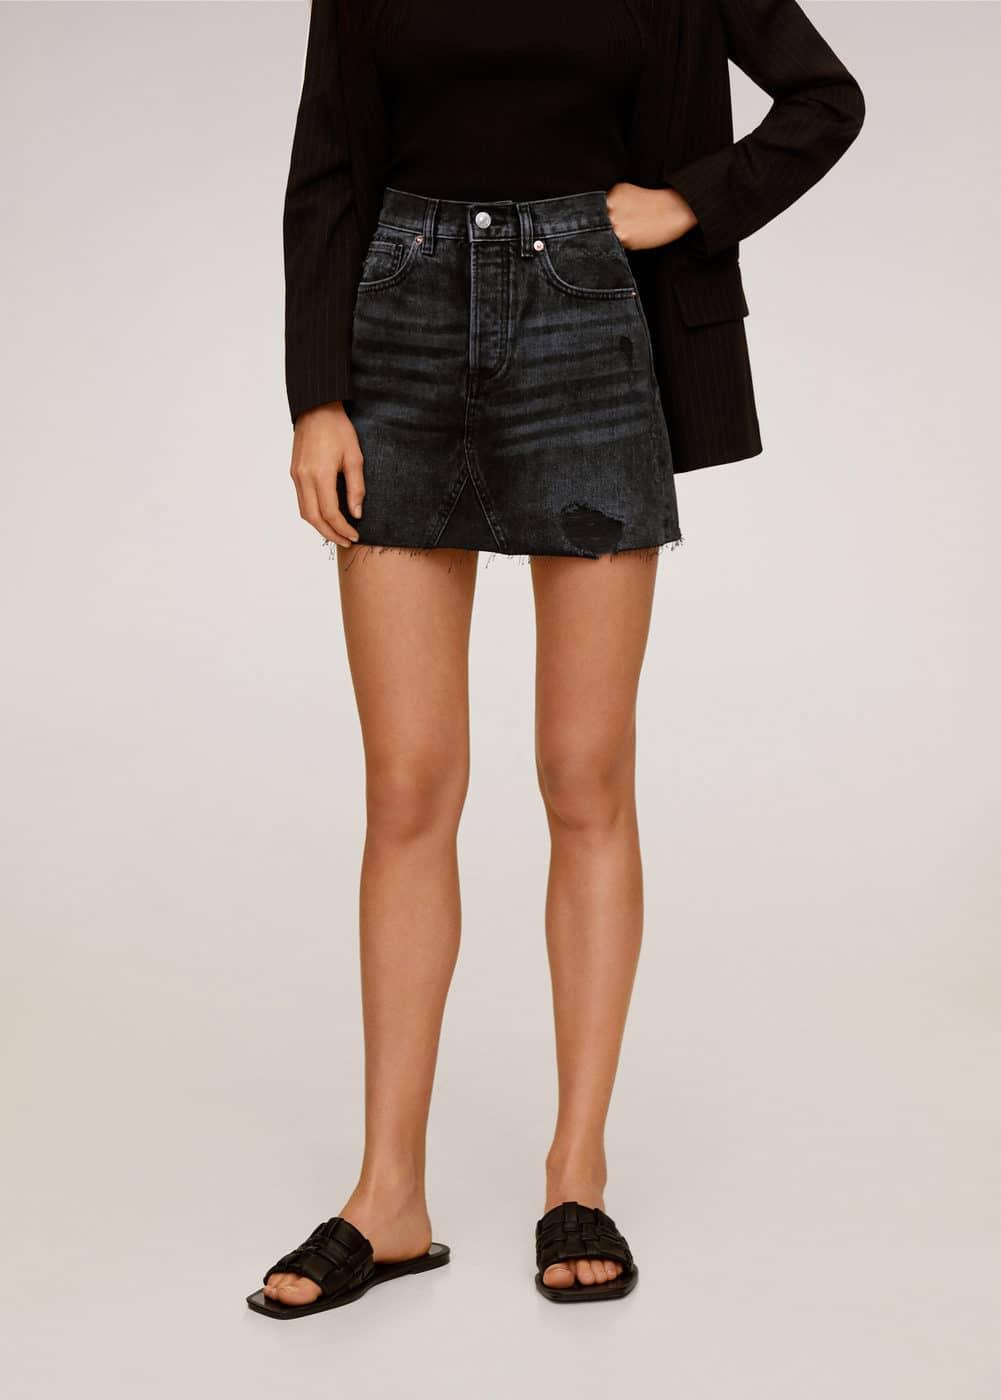 m-monica:minifalda denim